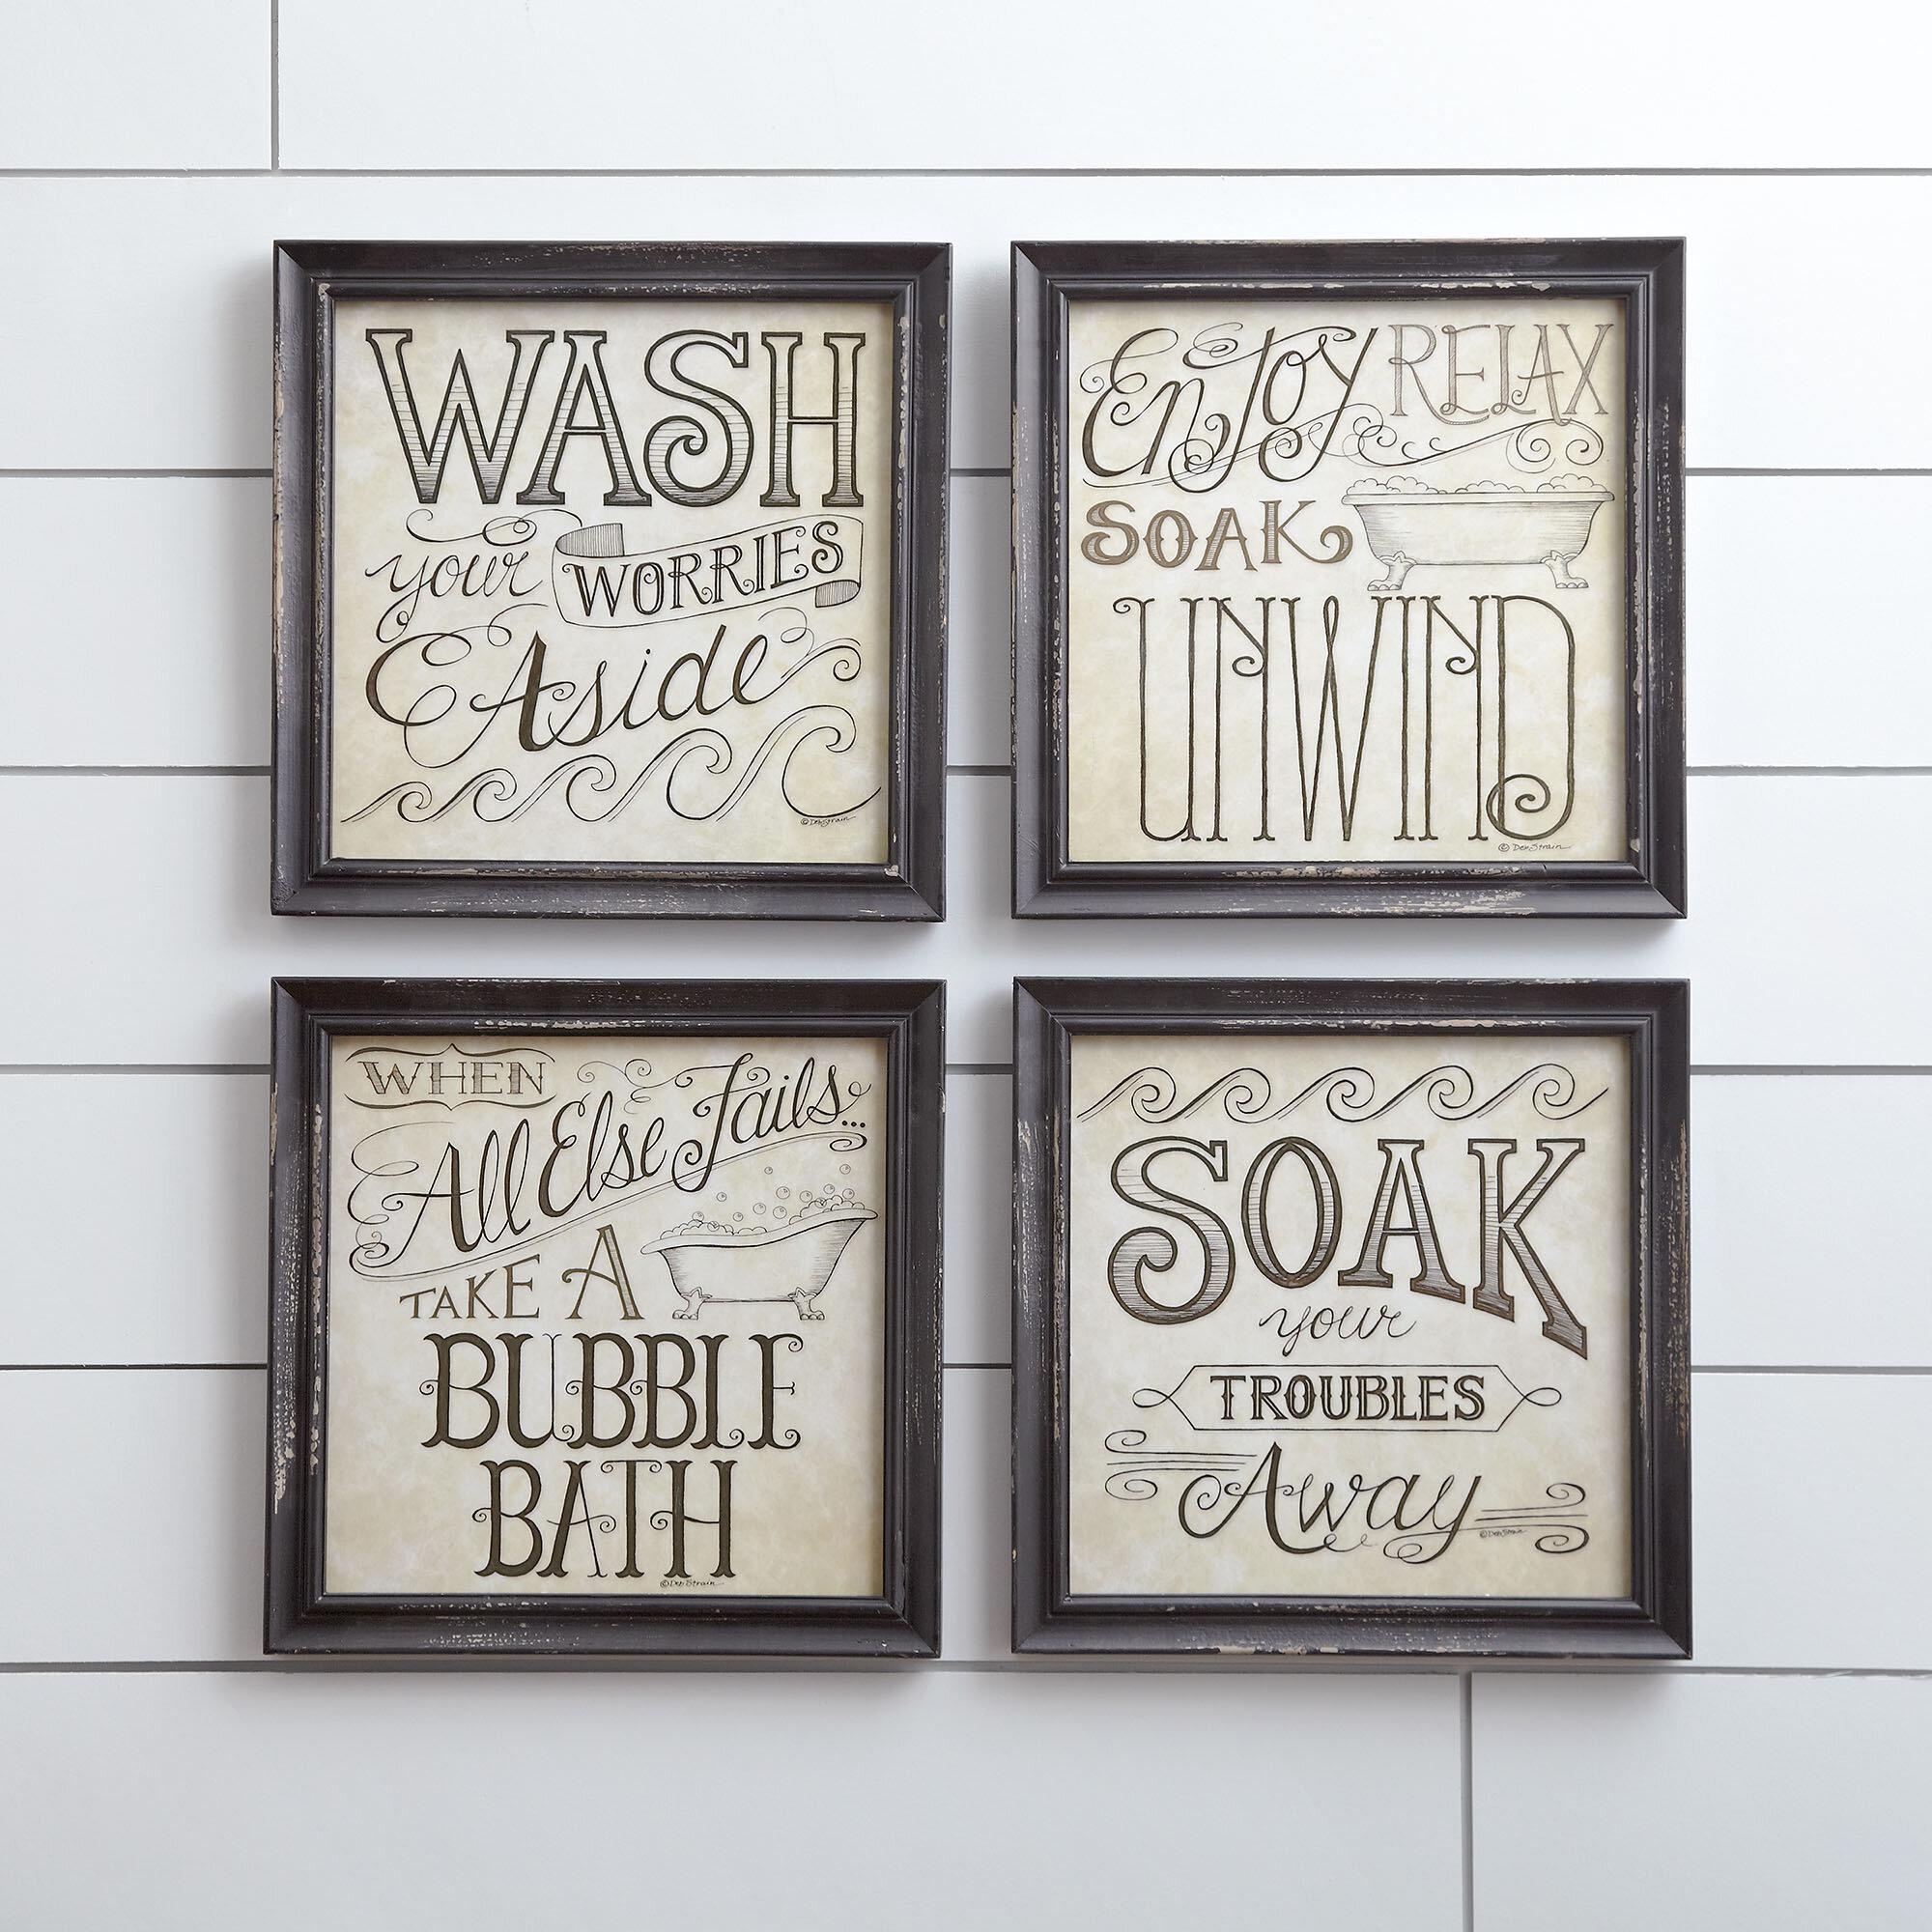 Bath & Laundry Gray Wall Art You'll Love in 2019 | Wayfair